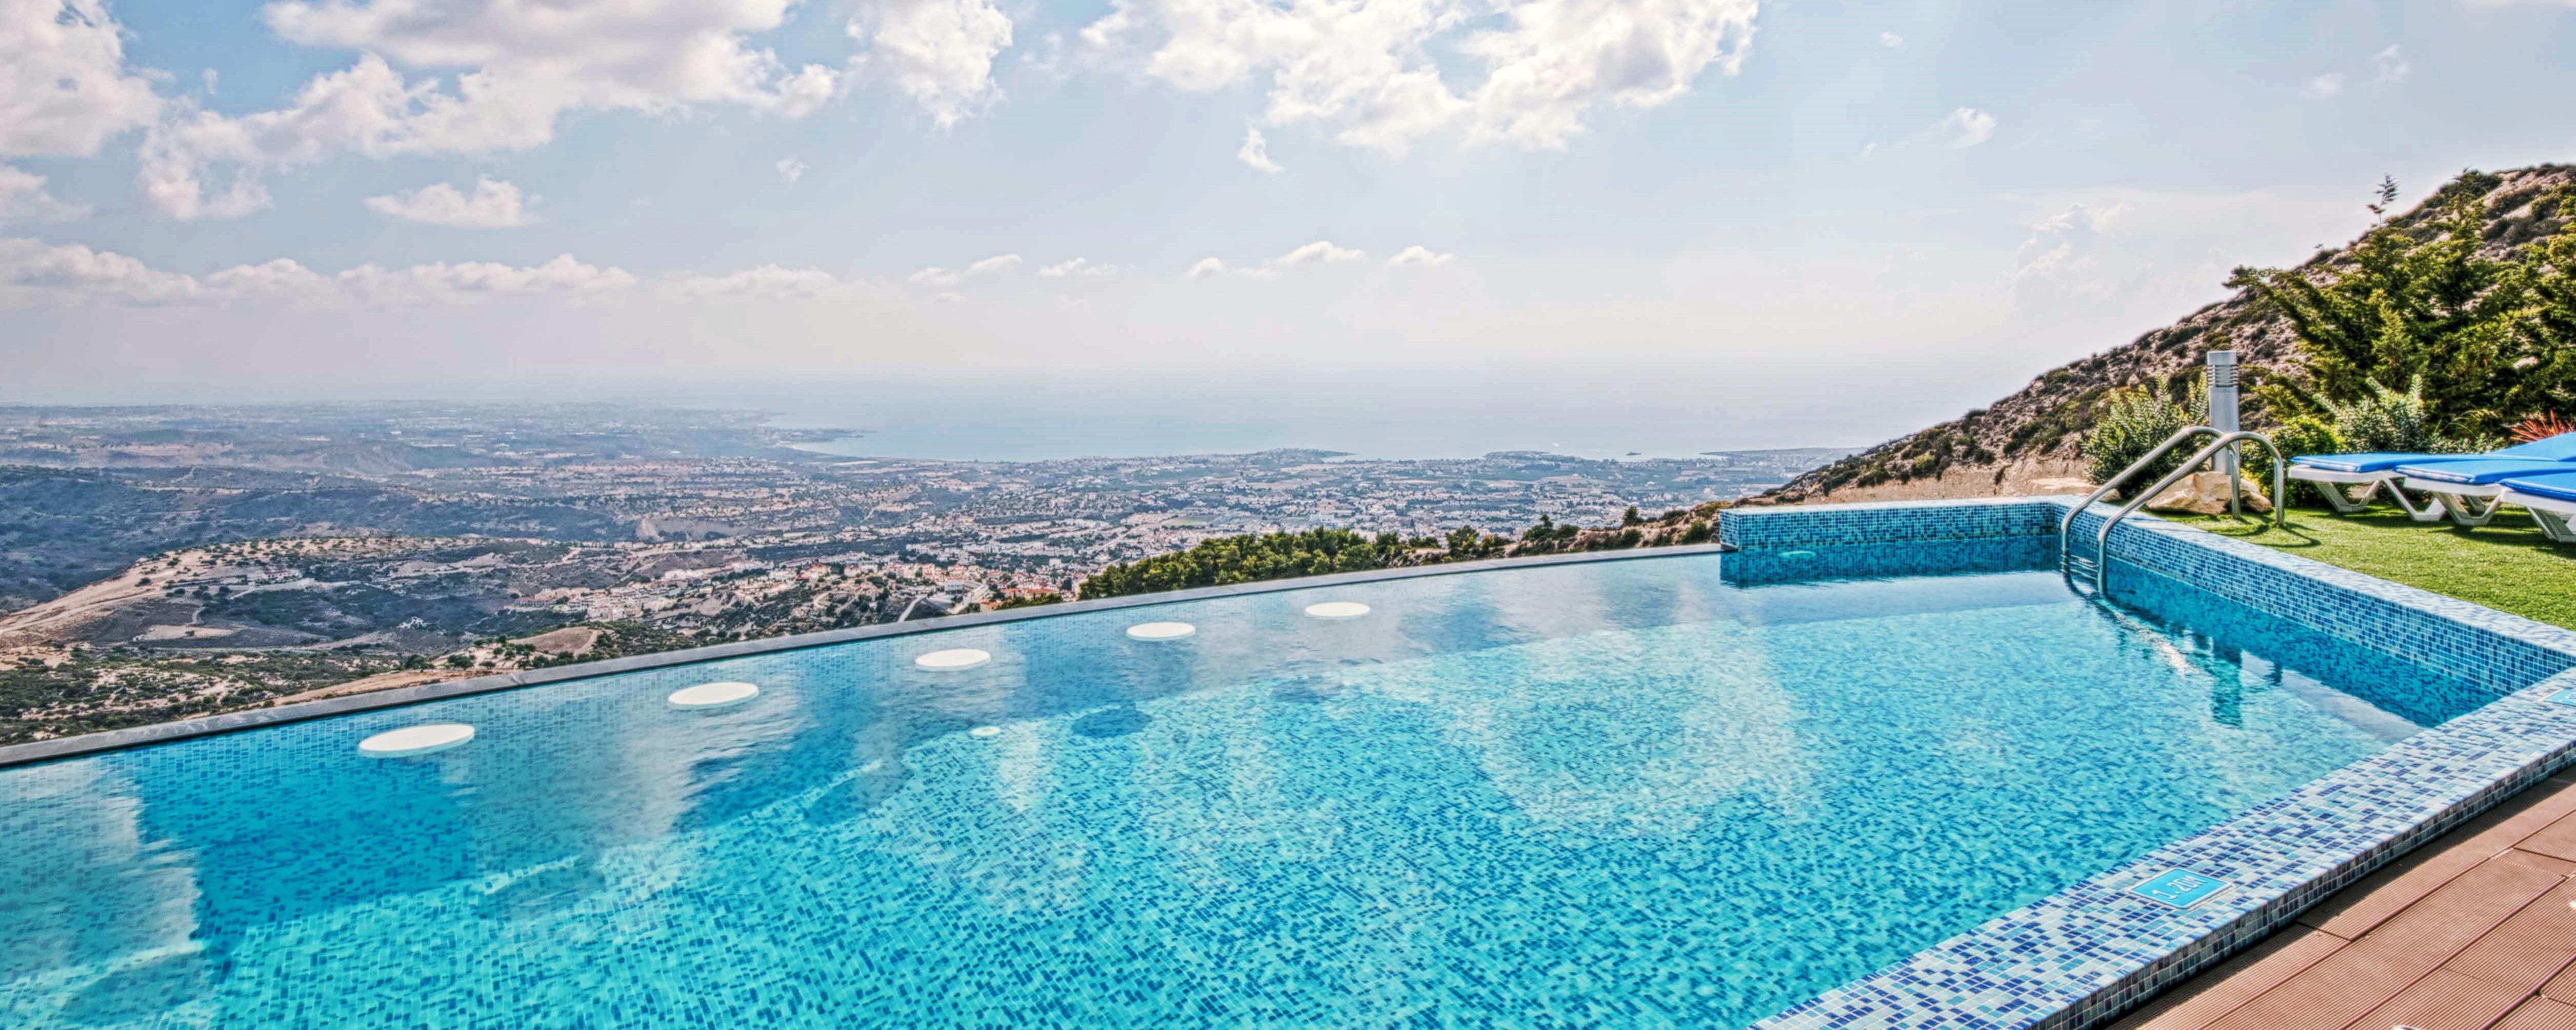 Villa Oceania Cyprus